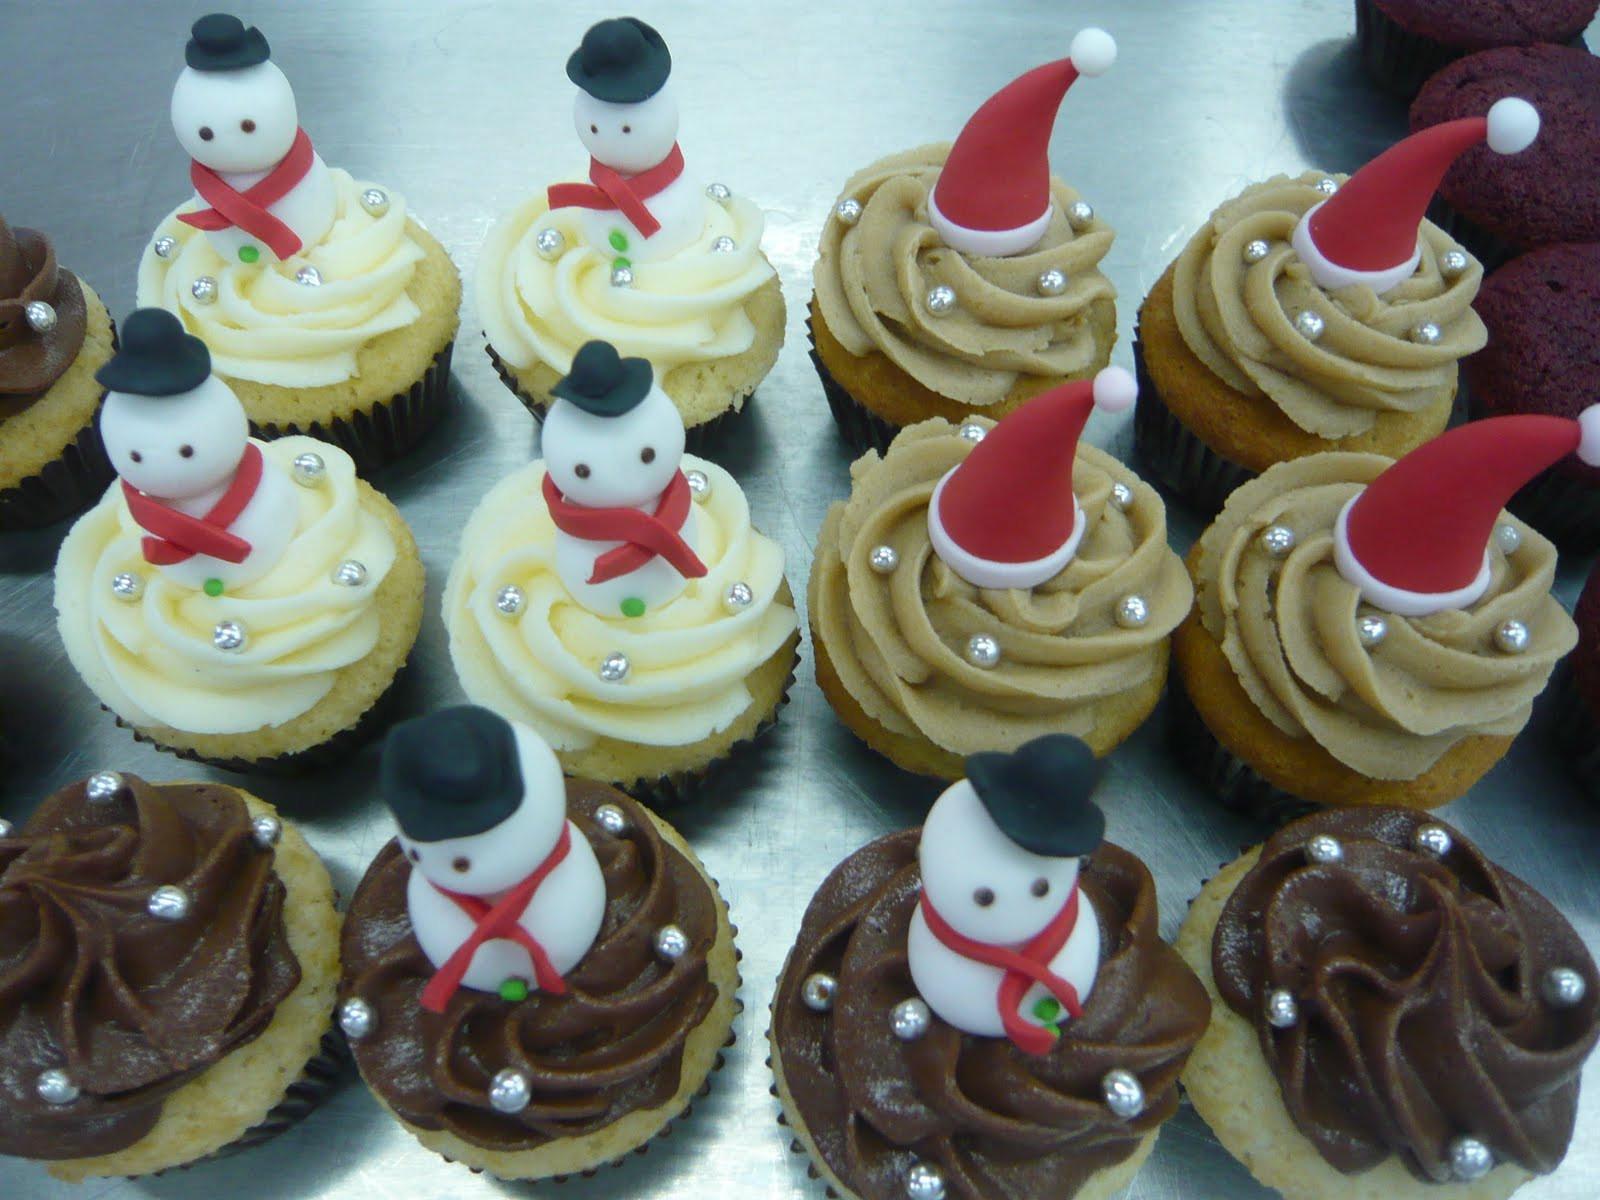 Christmas Themed Cupcakes  Christmas Themed Cupcakes 2015 Merry Christmas 2015